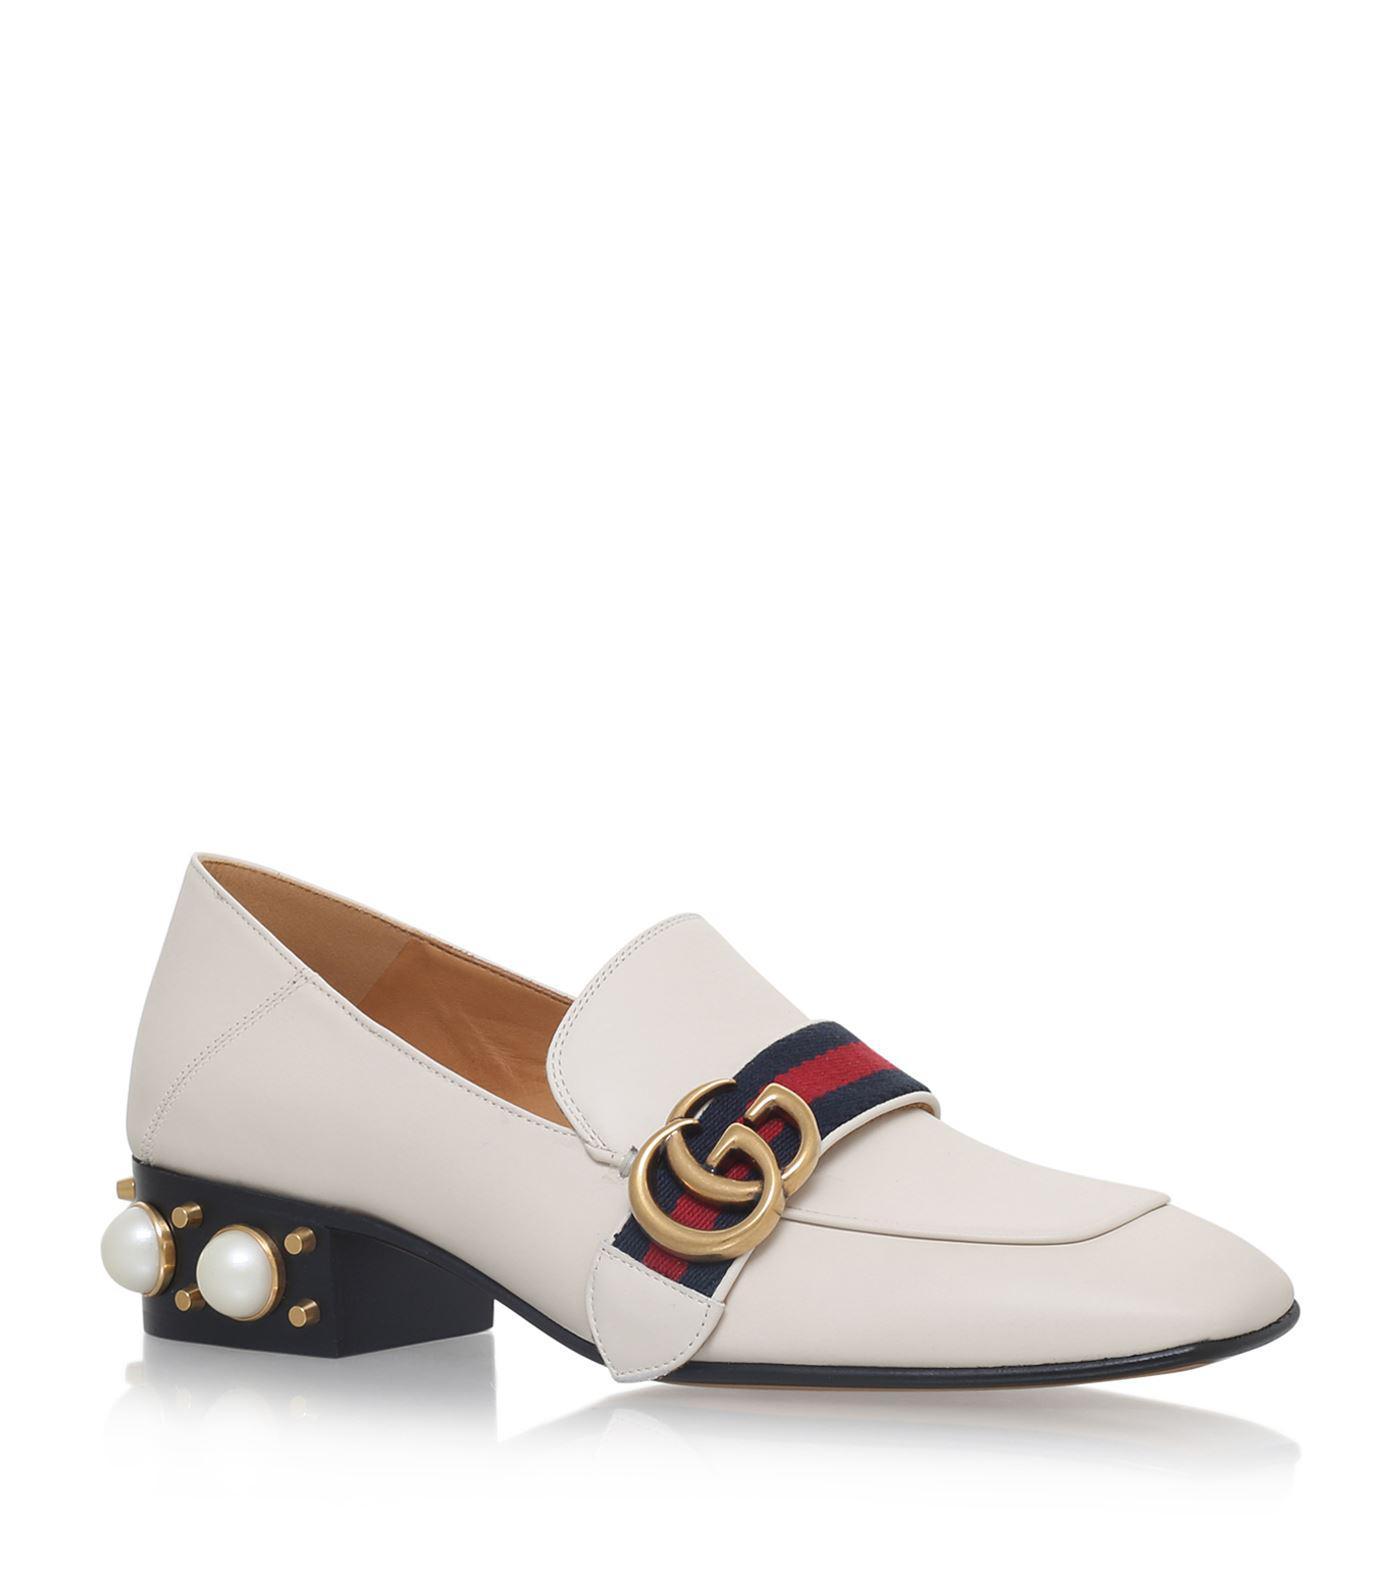 8ec6a3a63104 Gucci. Women s White Embellished Peyton Court Shoes 75